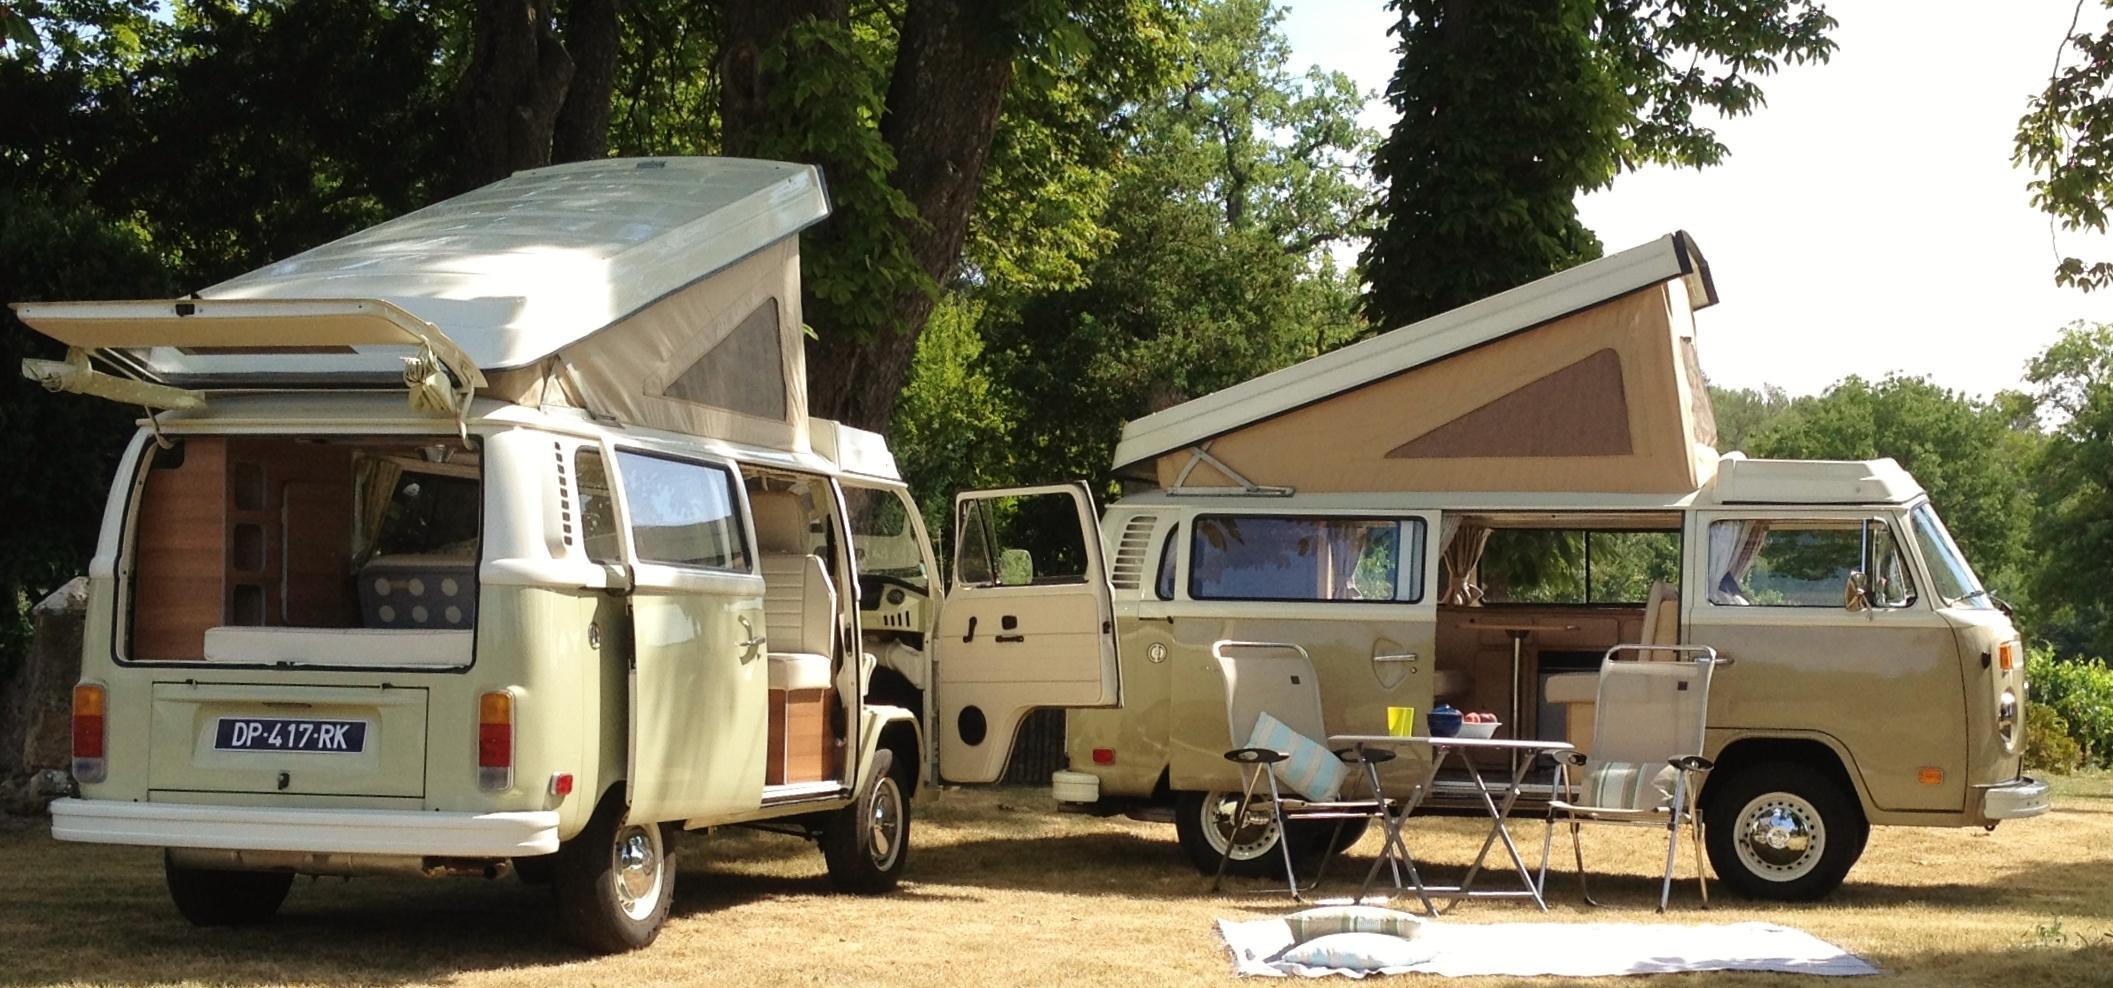 directory of volkswagen vw camper hire rental companies. Black Bedroom Furniture Sets. Home Design Ideas